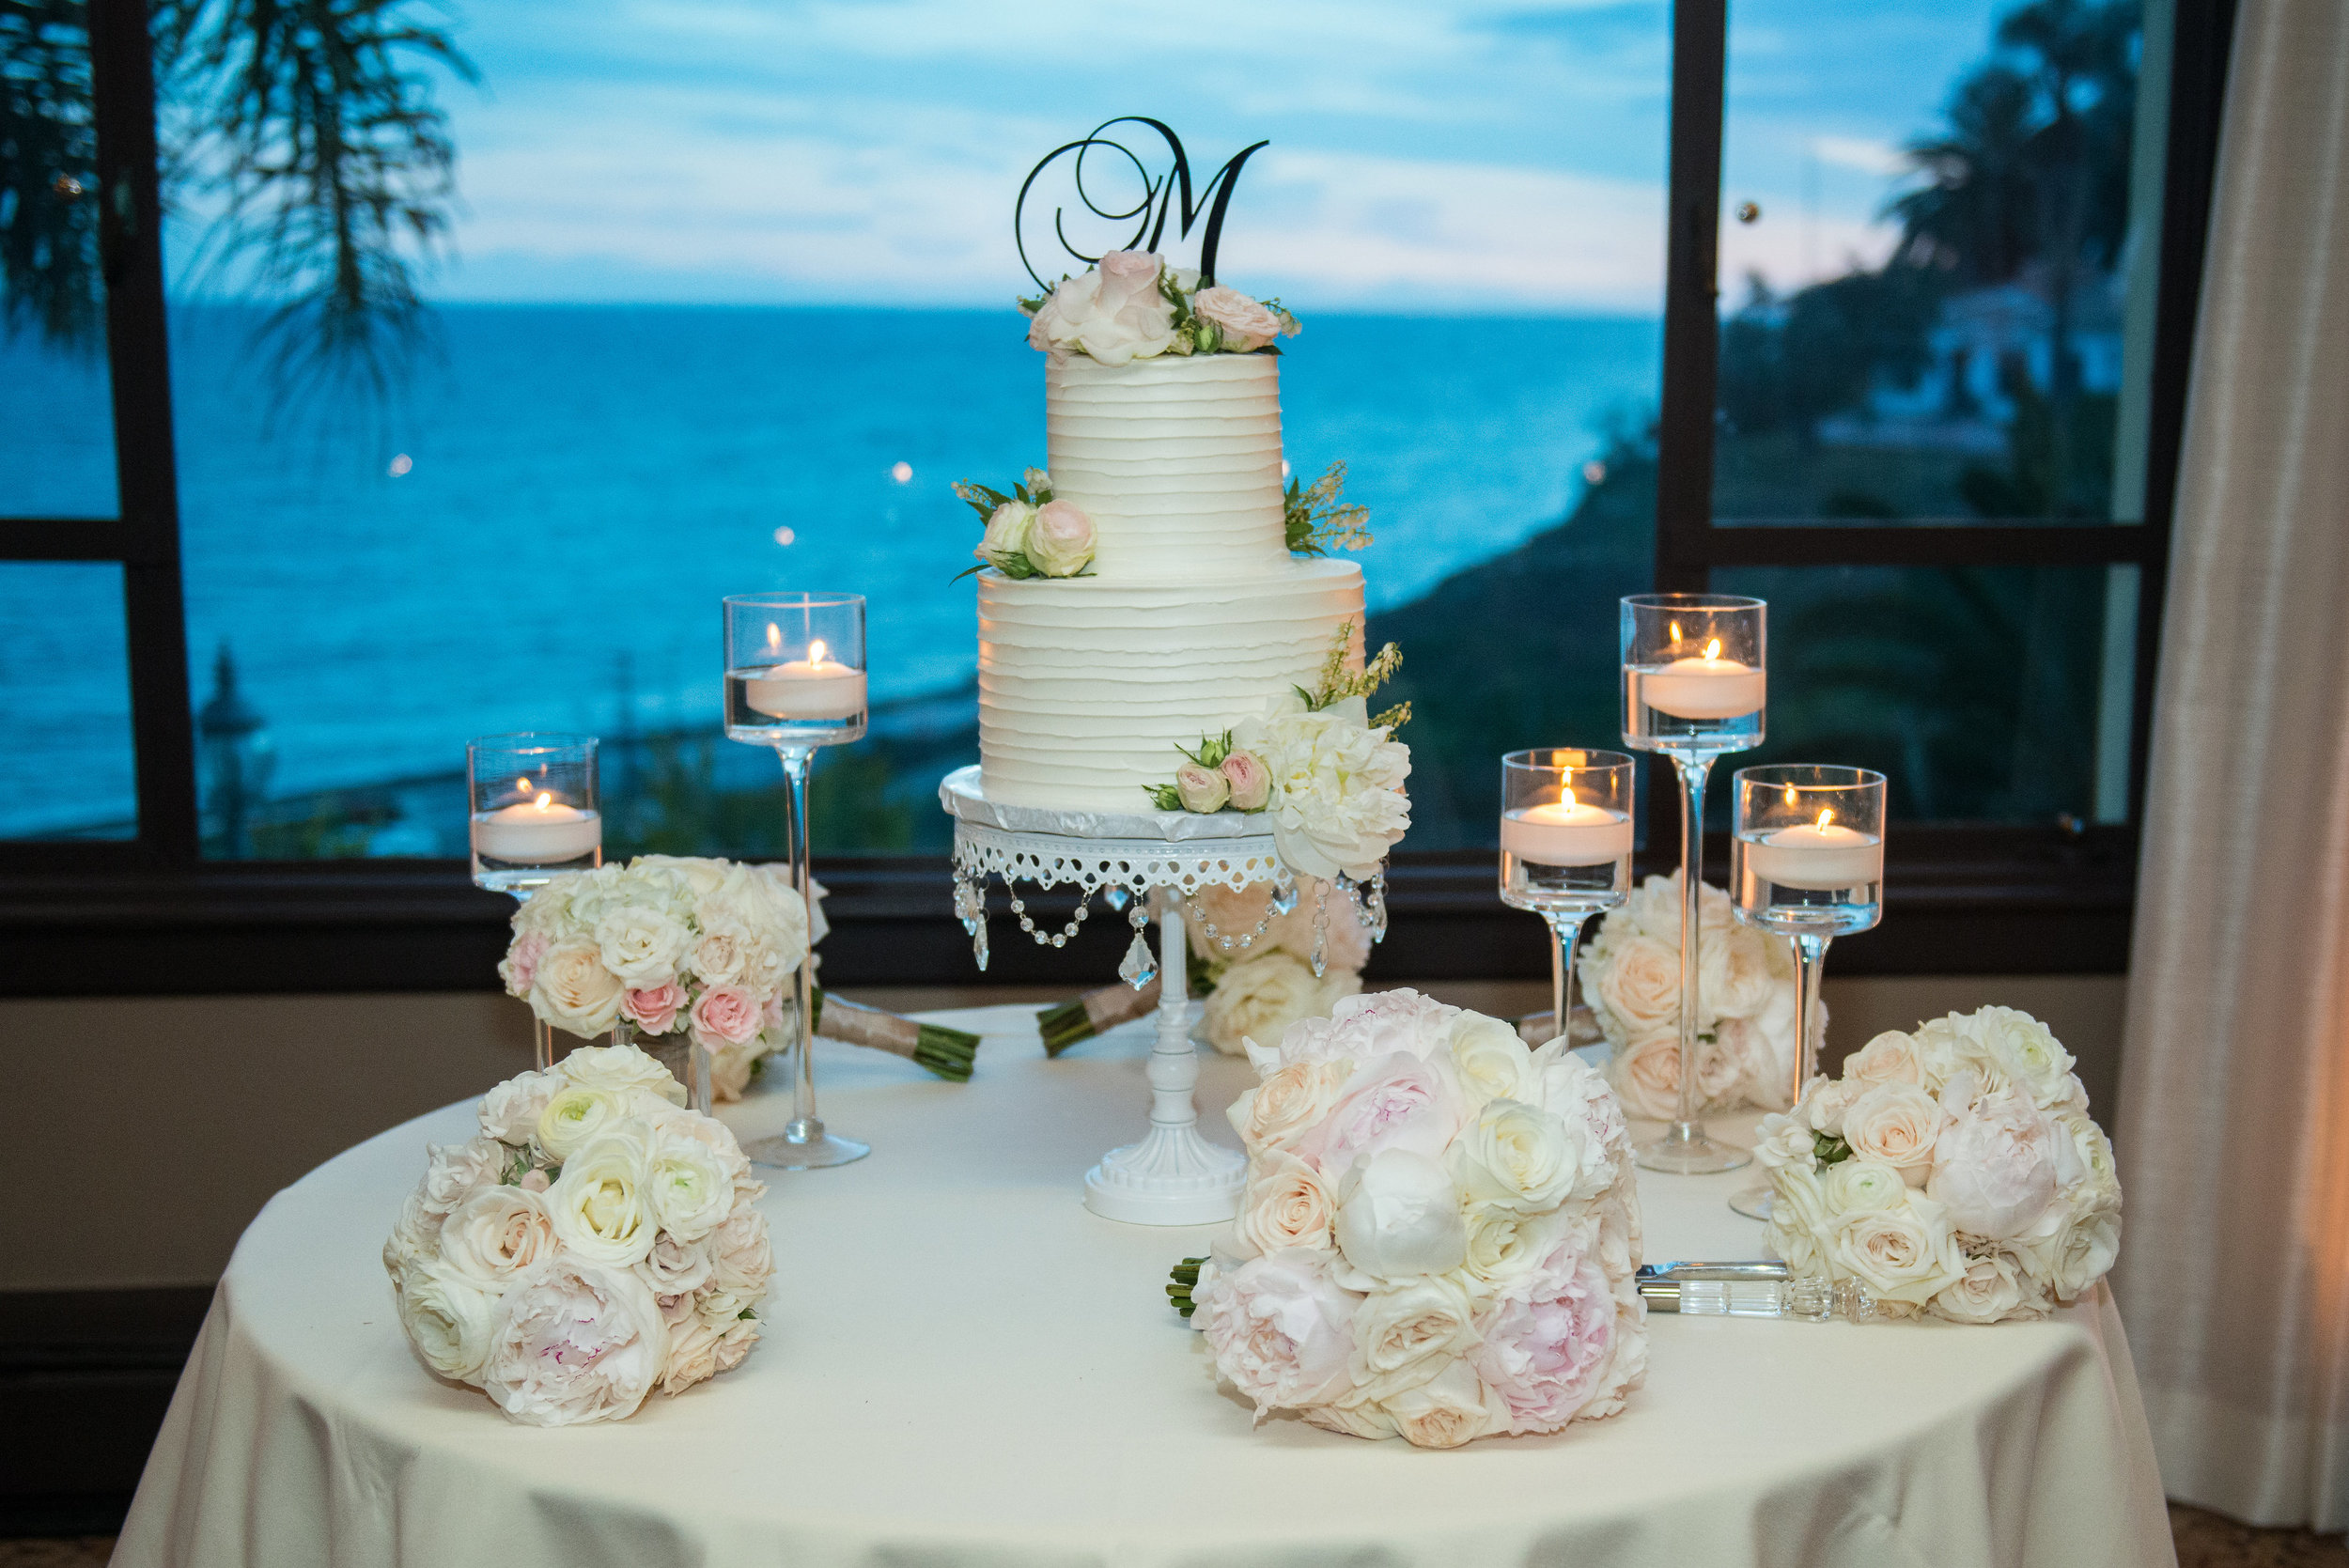 white tiered wedding cake white chandelier cake stand opulent treasures.jpg